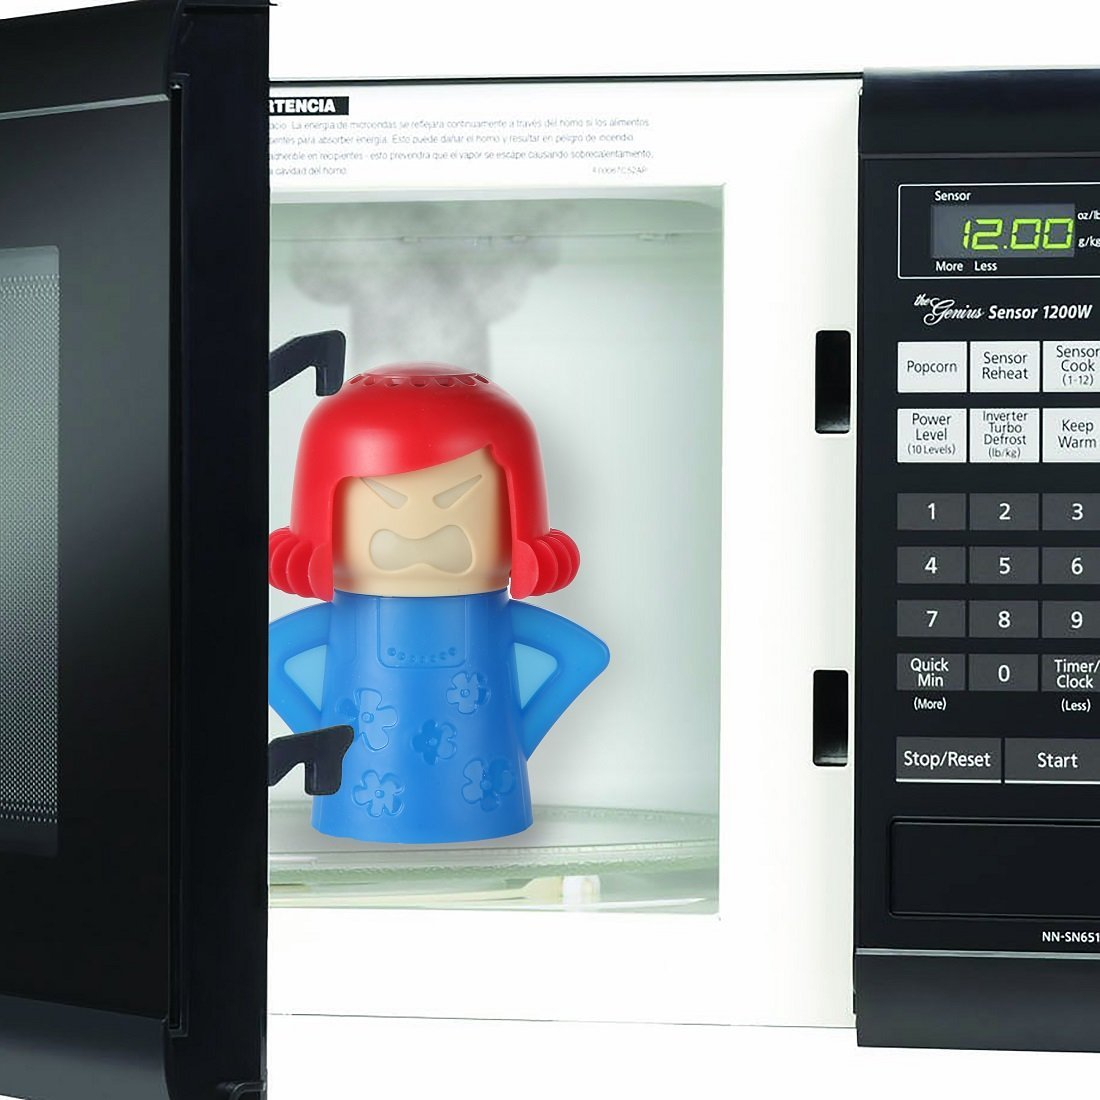 Home-X Steam'n Mama Microwave Cleaner